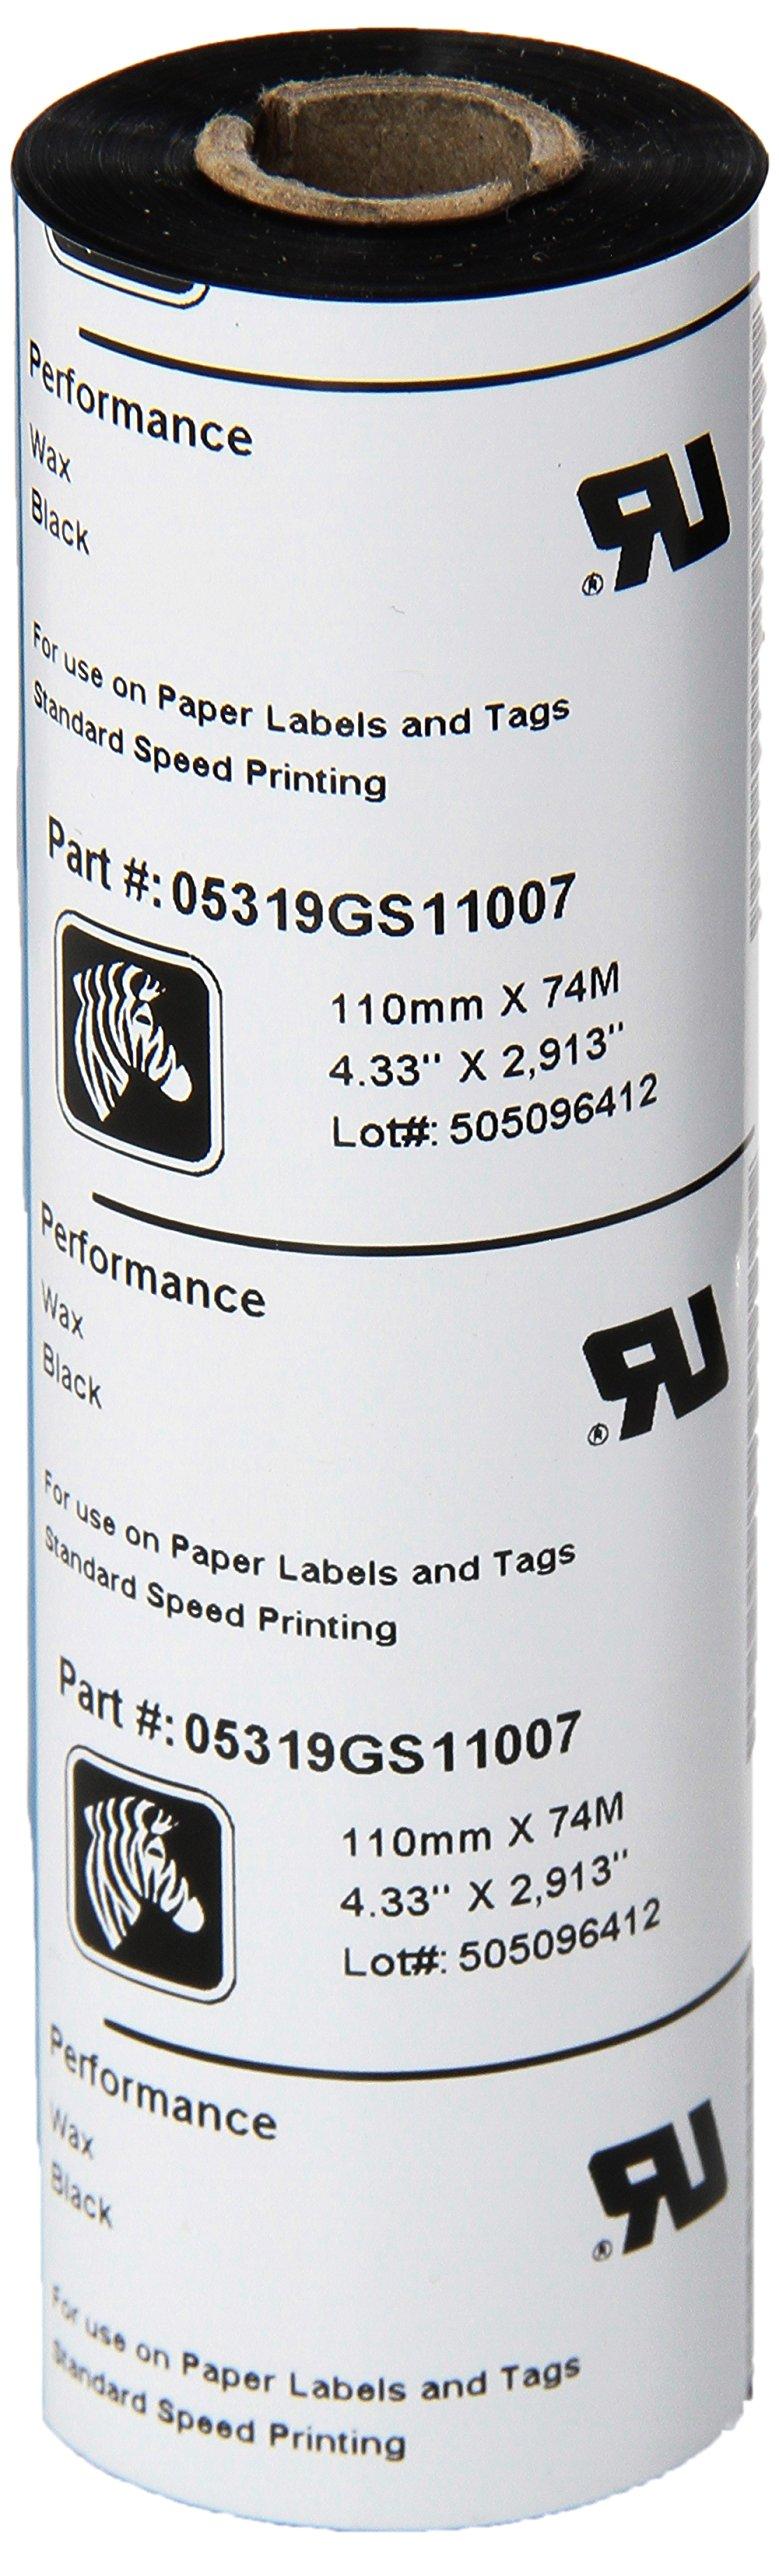 Zebra Technologies 05319GS11007 Wax Ribbon, 0.5'' Core for Desktop Printers, 4.33'' x 244', Black (Pack of 12)